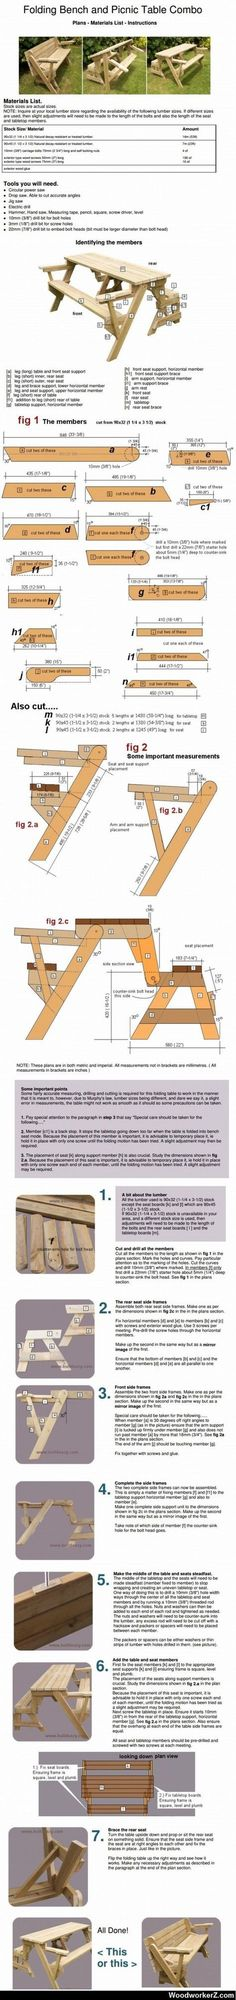 Folding Bench Picnic Table Comco